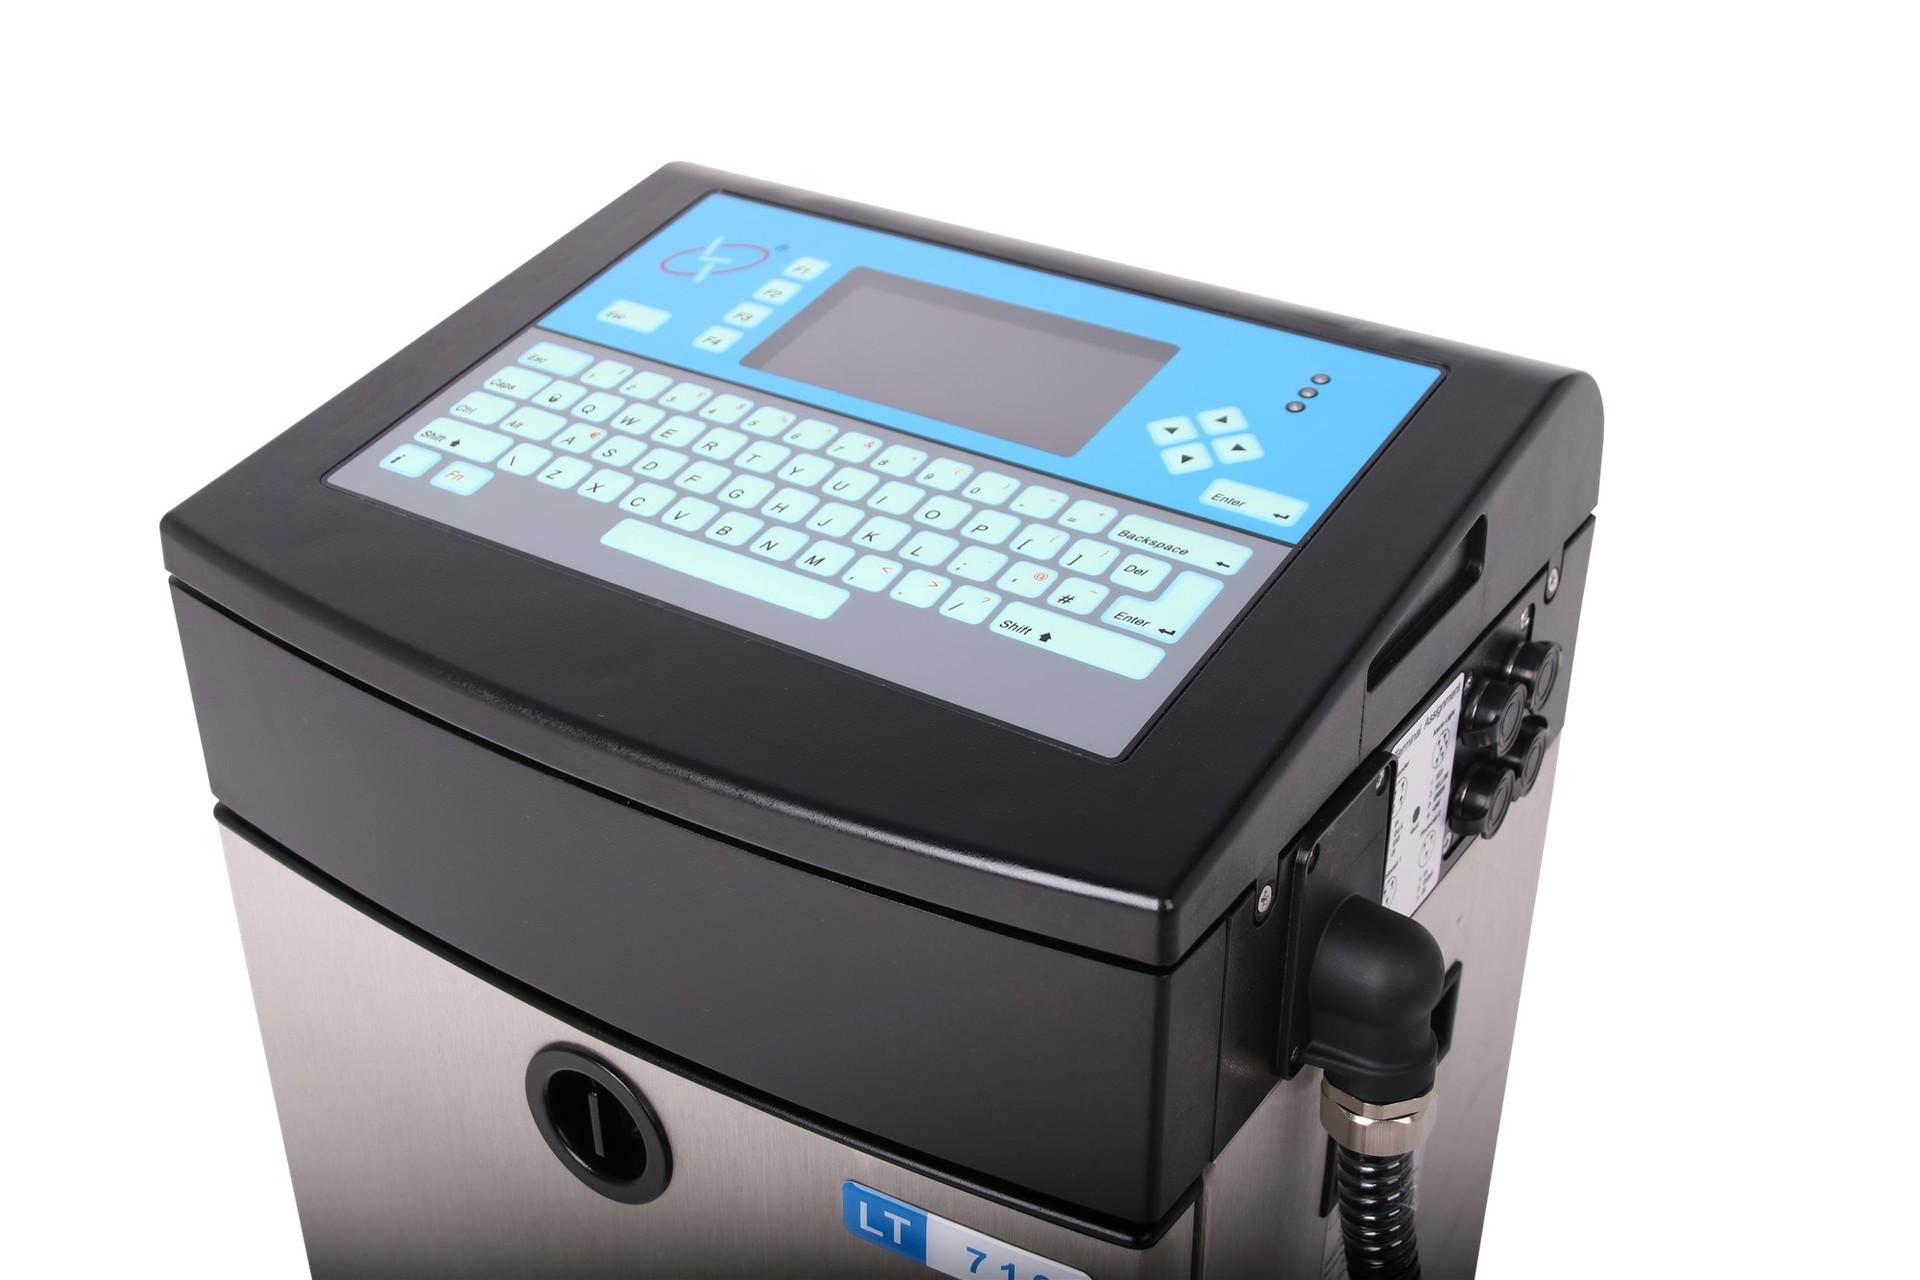 Lead Tech Lt710 Cij Inkjet Printer for PE Pipe Coding